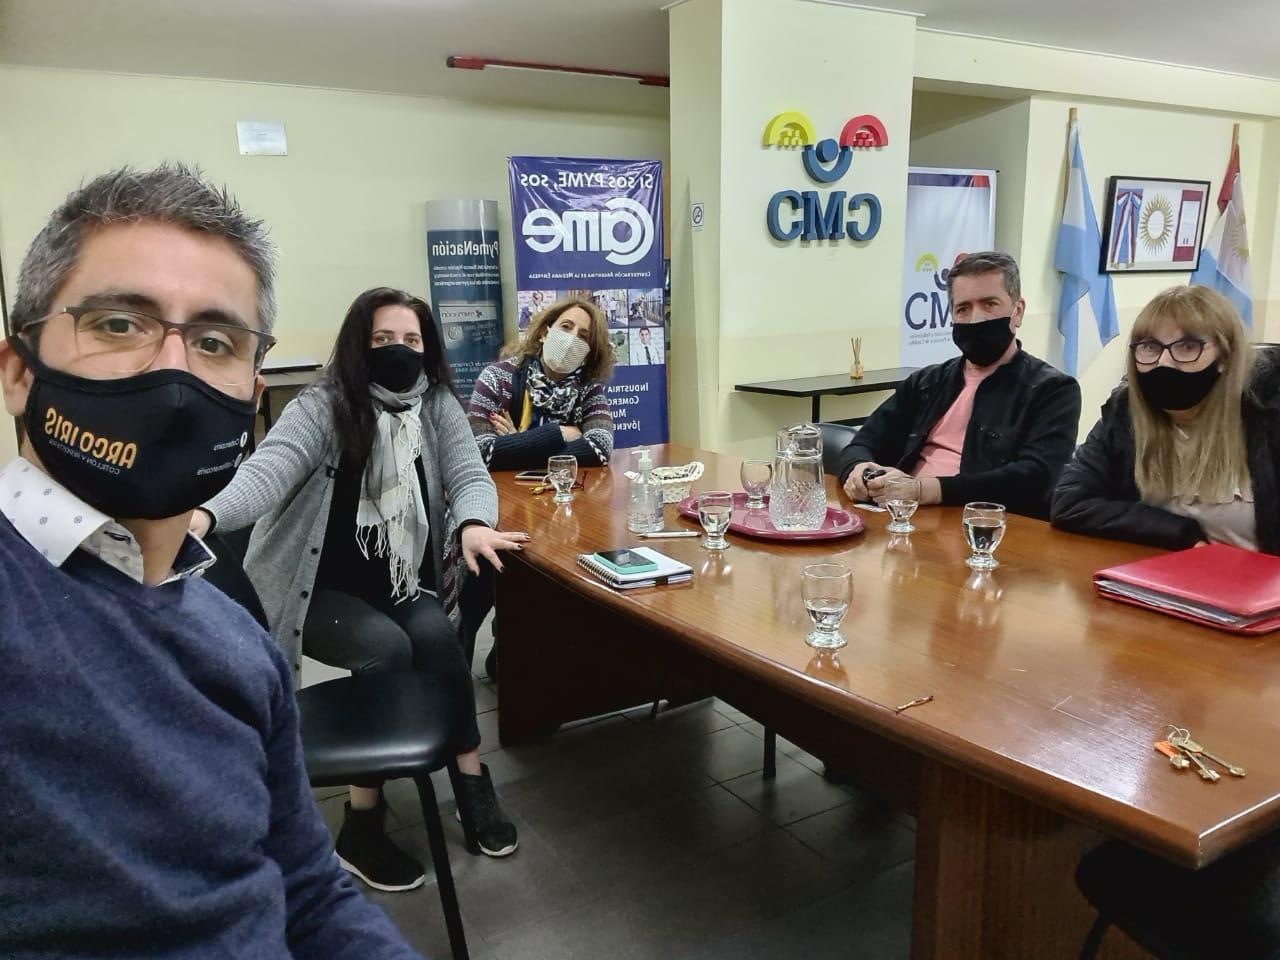 Reunión con autoridades del Mercado Sur